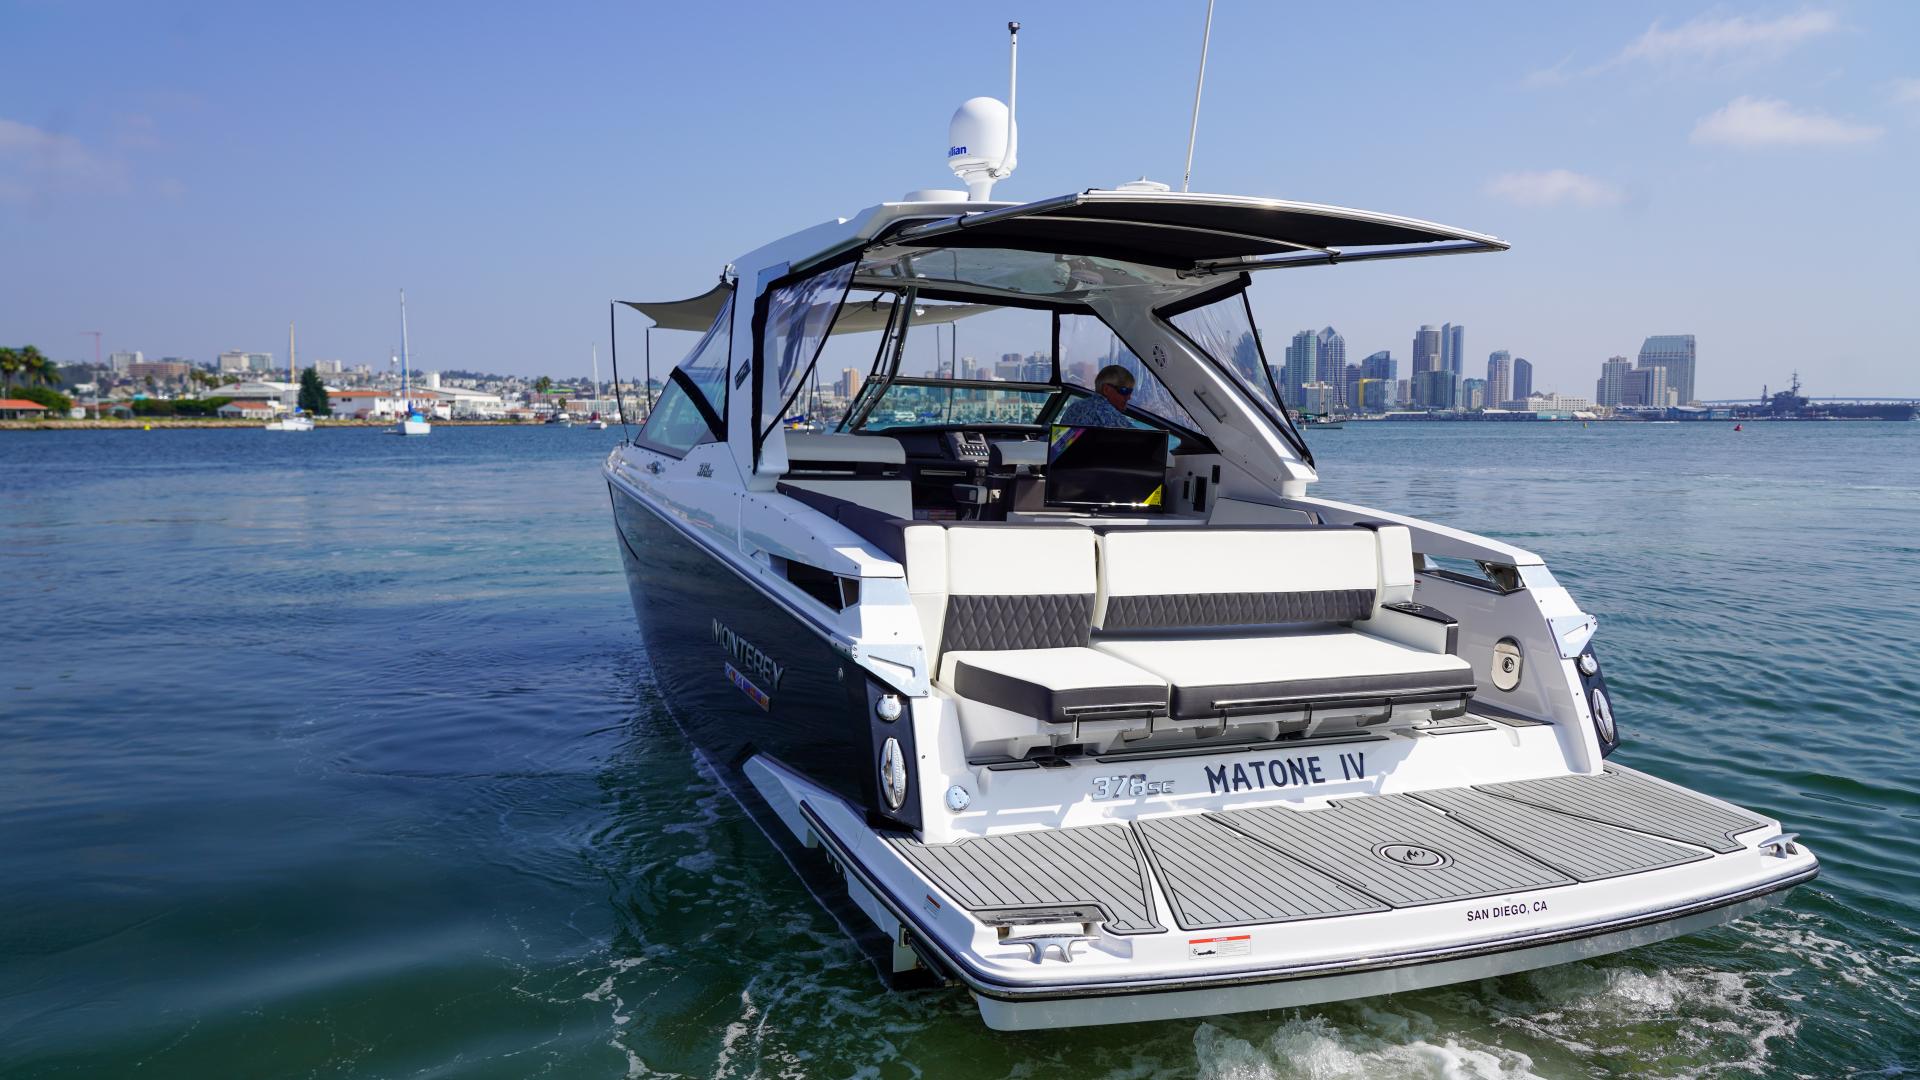 Monterey-378SE 2019-MATONE IV California-United States-STERN-1511153   Thumbnail